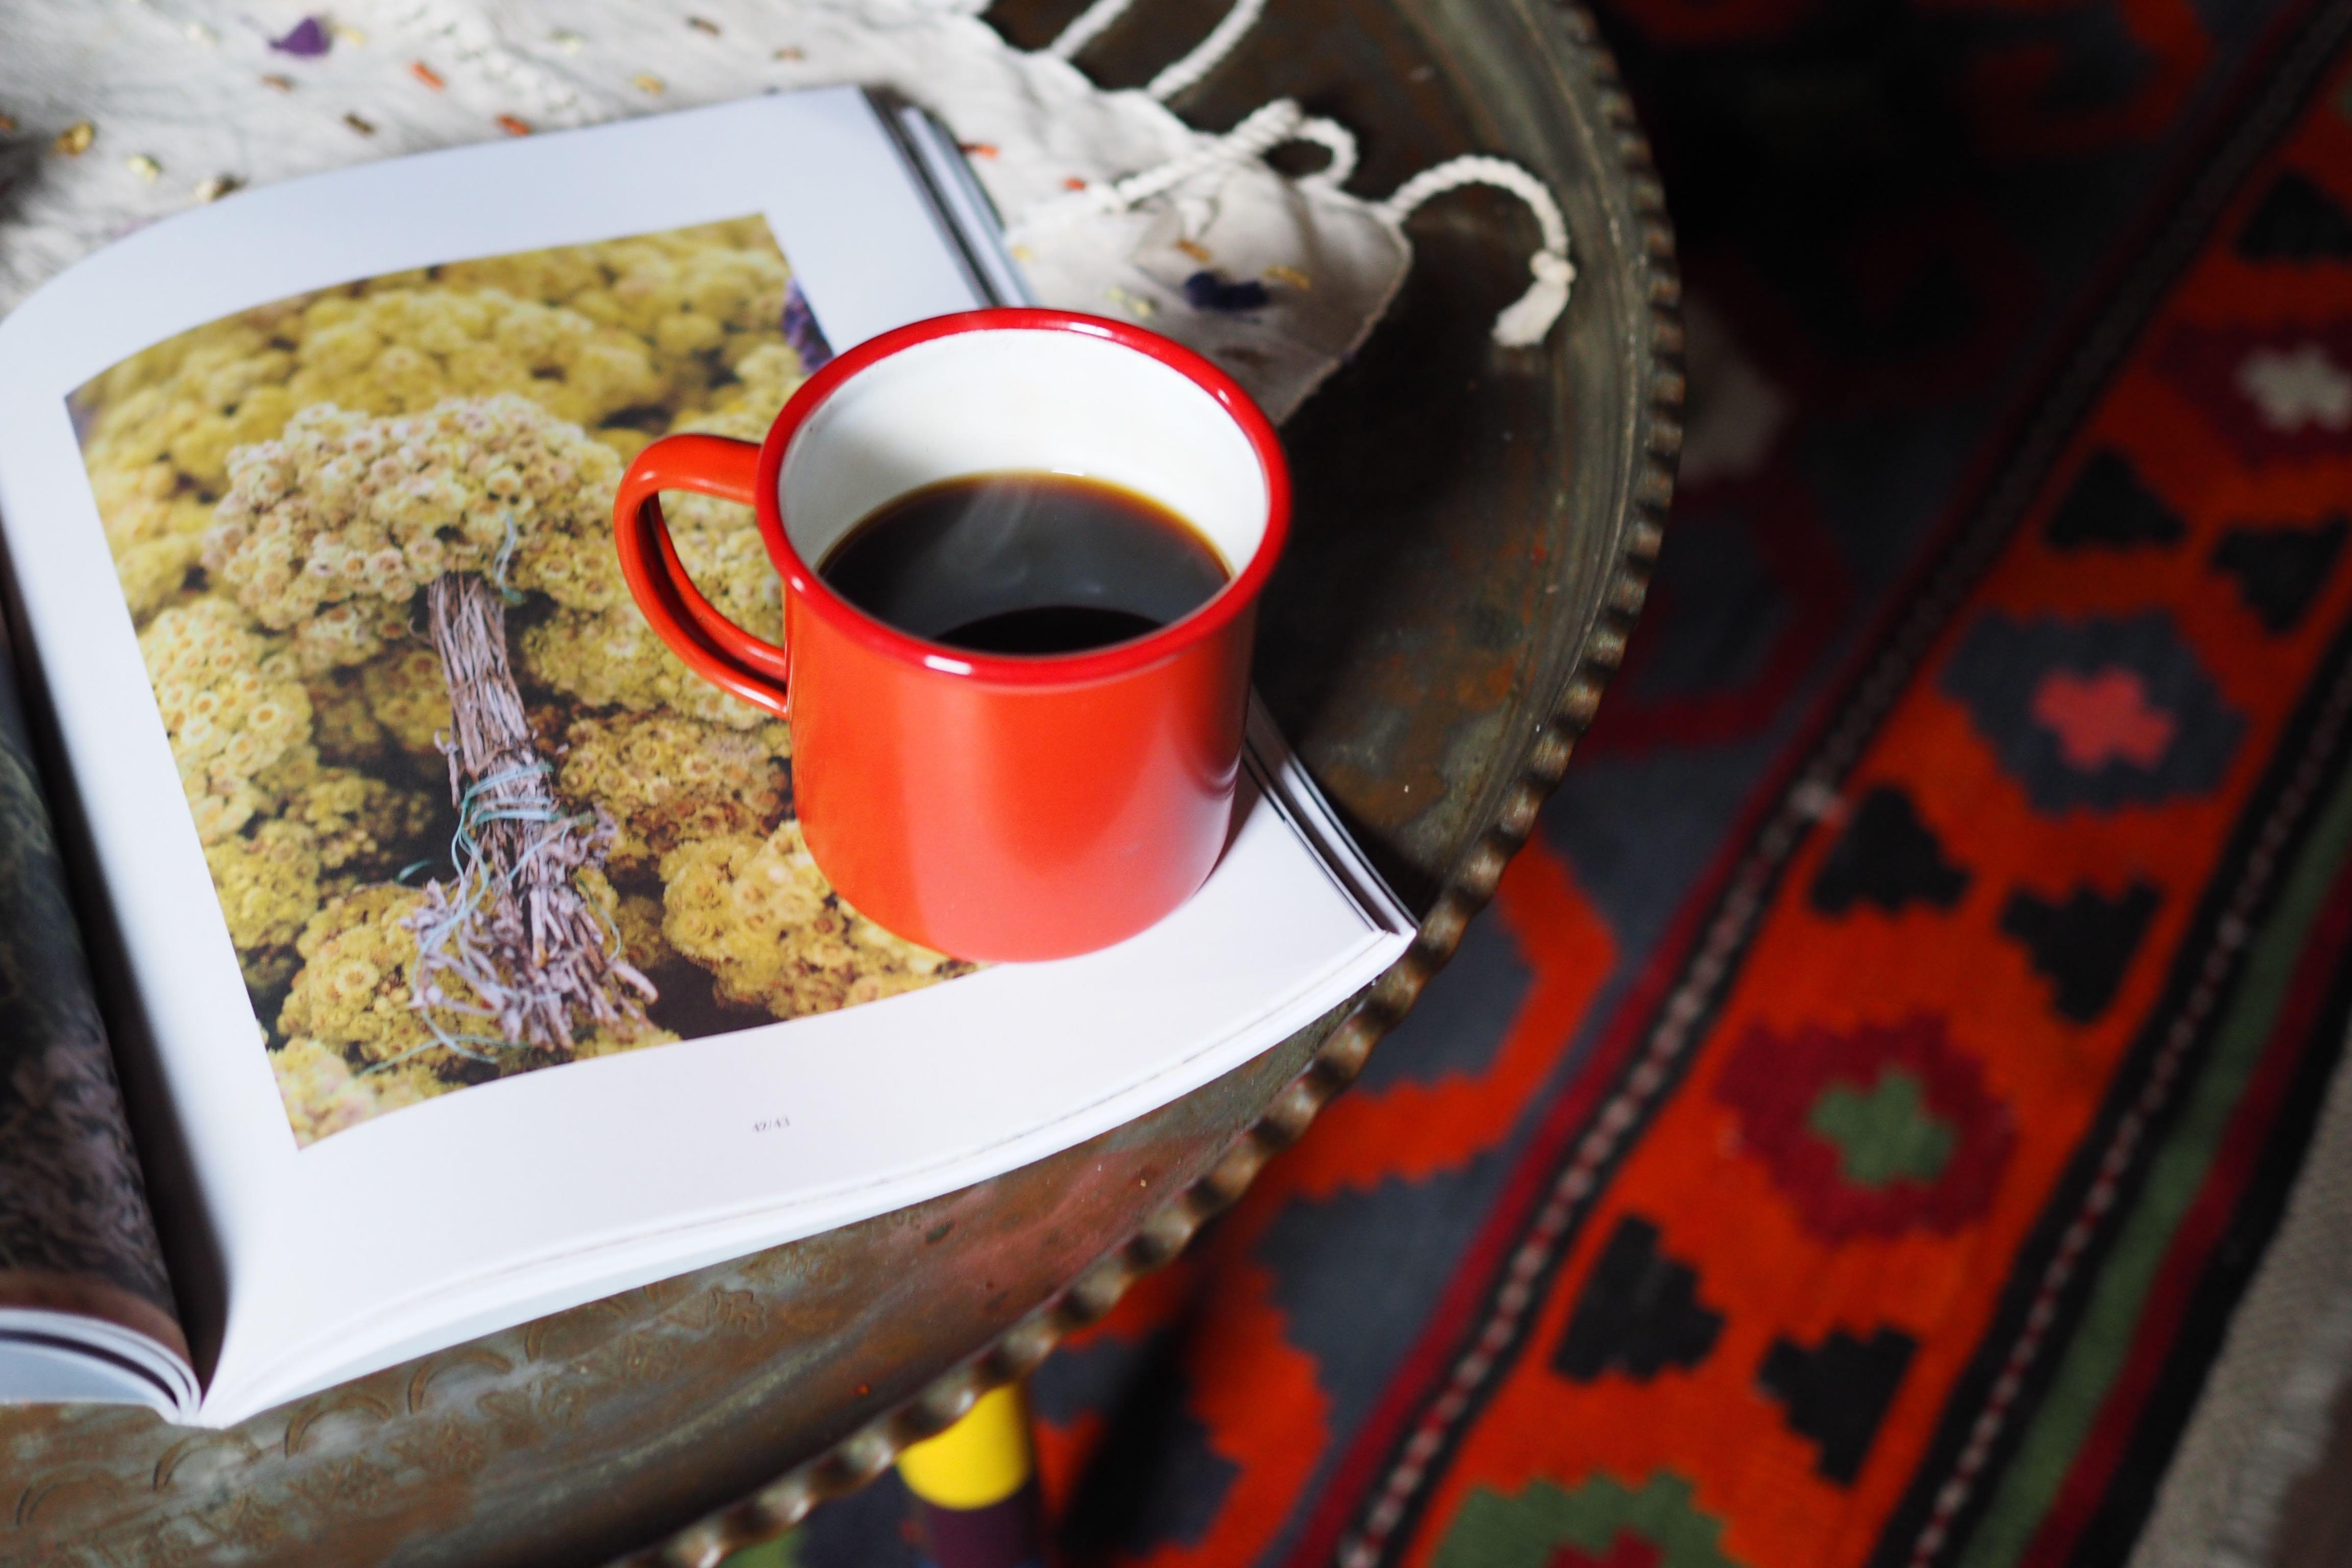 billur saatci, off nereye gitsem, offnegiysem, travel, karadeniz, billurkaradenizdiary, seyahat, turkish style blogger, rize, gito